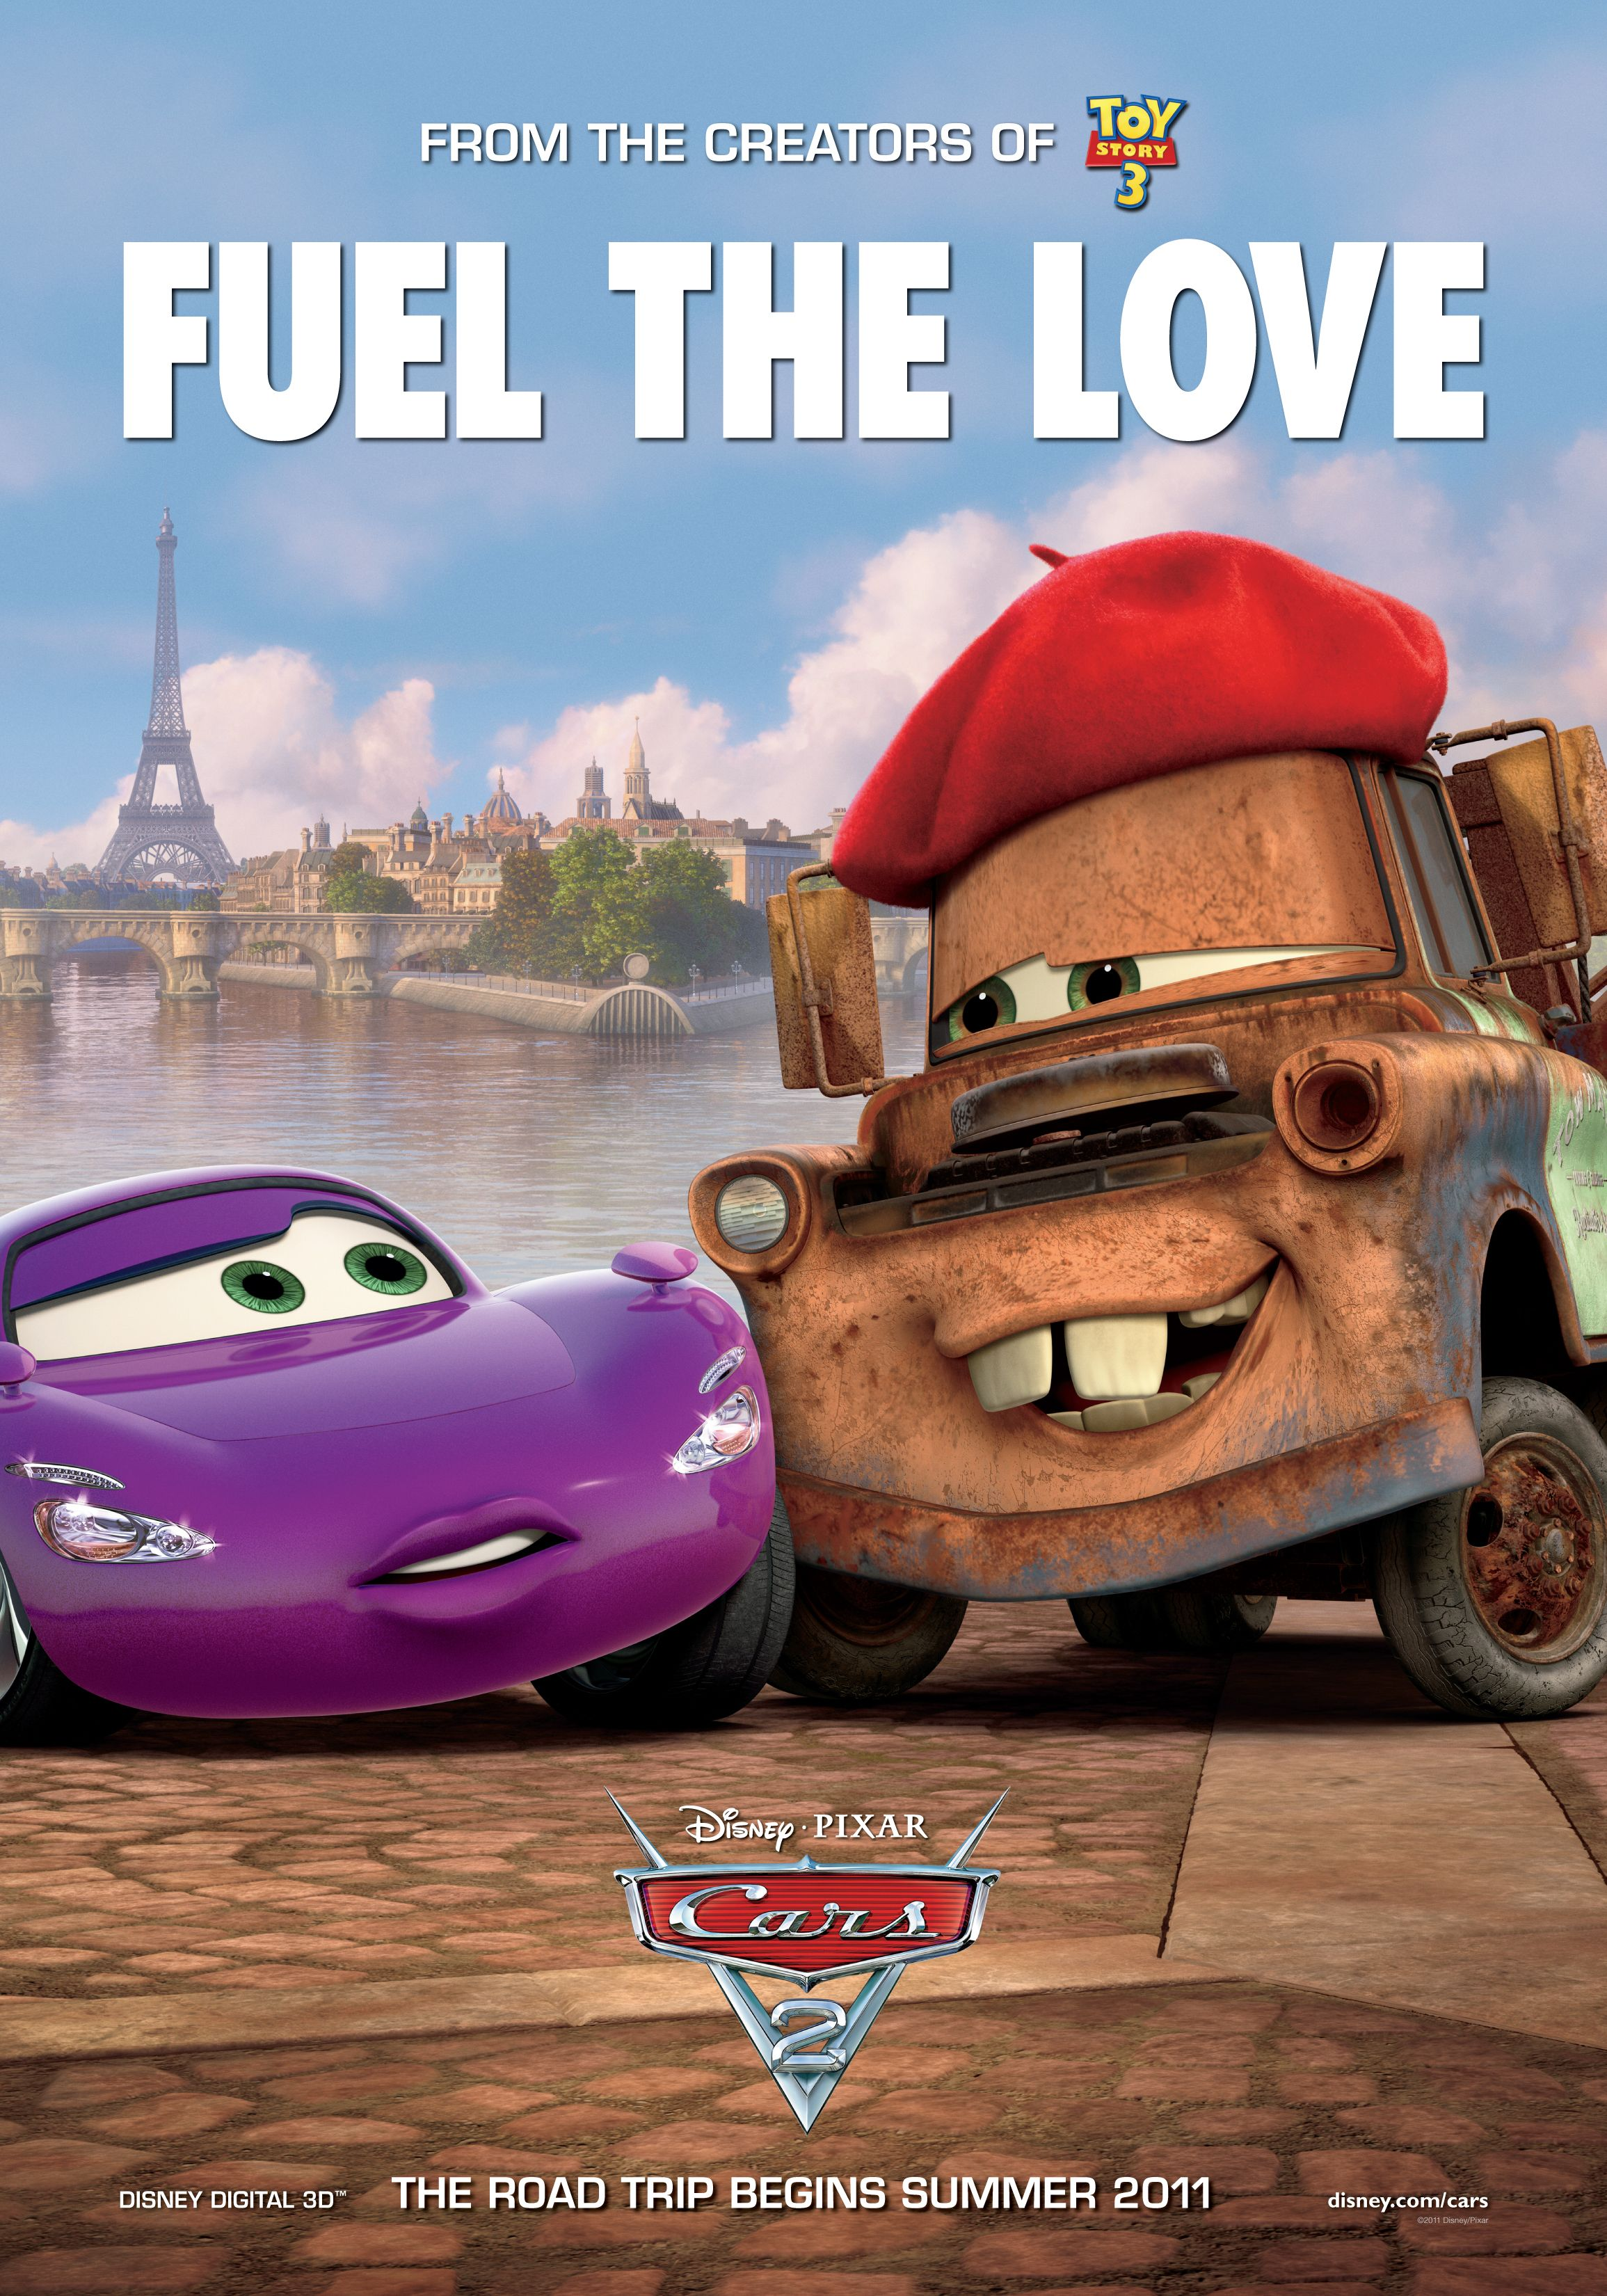 Disney Pixar Cars 2 Free Family Fun Craft Activities And More Disney Pixar Cars Disney Cars Cars 2 Movie